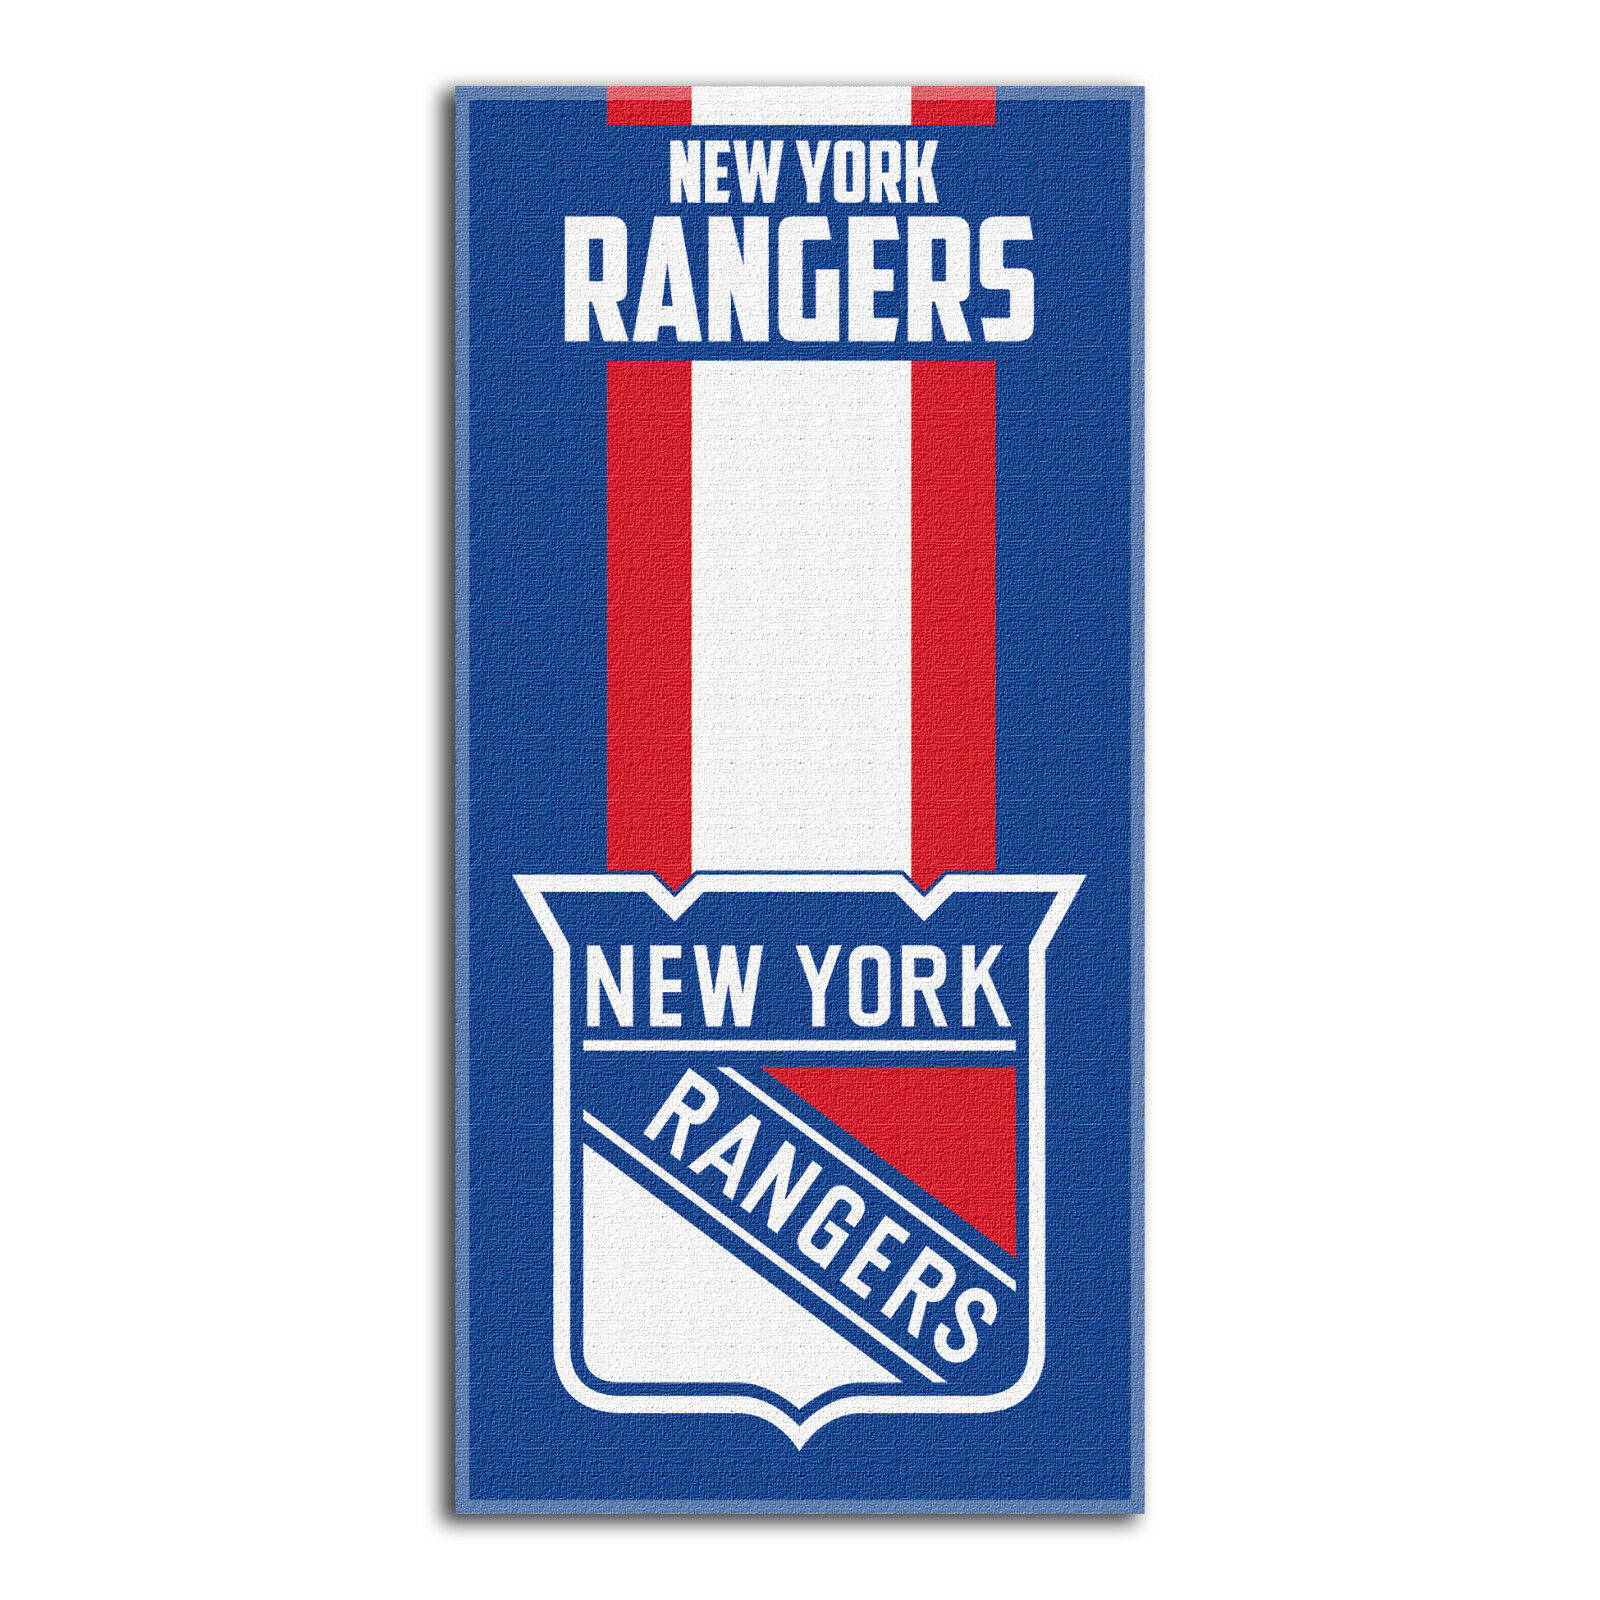 NHL New York Rangers Rangers Rangers NY großes Badetuch Handtuch Zone-Read-Beach Towel 150x75cm 98c79c